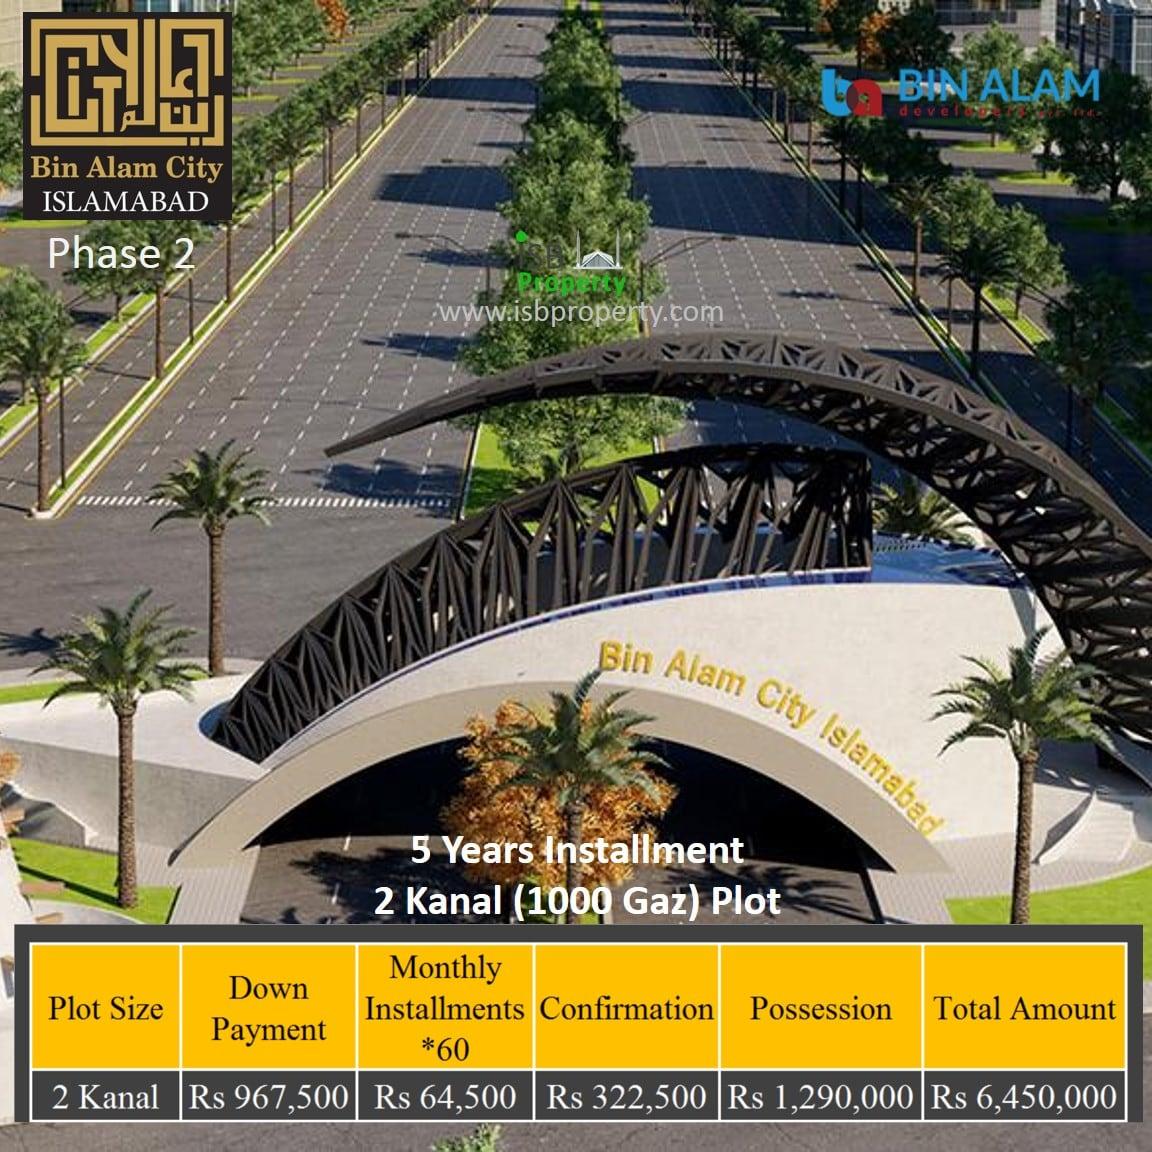 2 Kanal Plot on Installment at Bin Alam City Phase 2